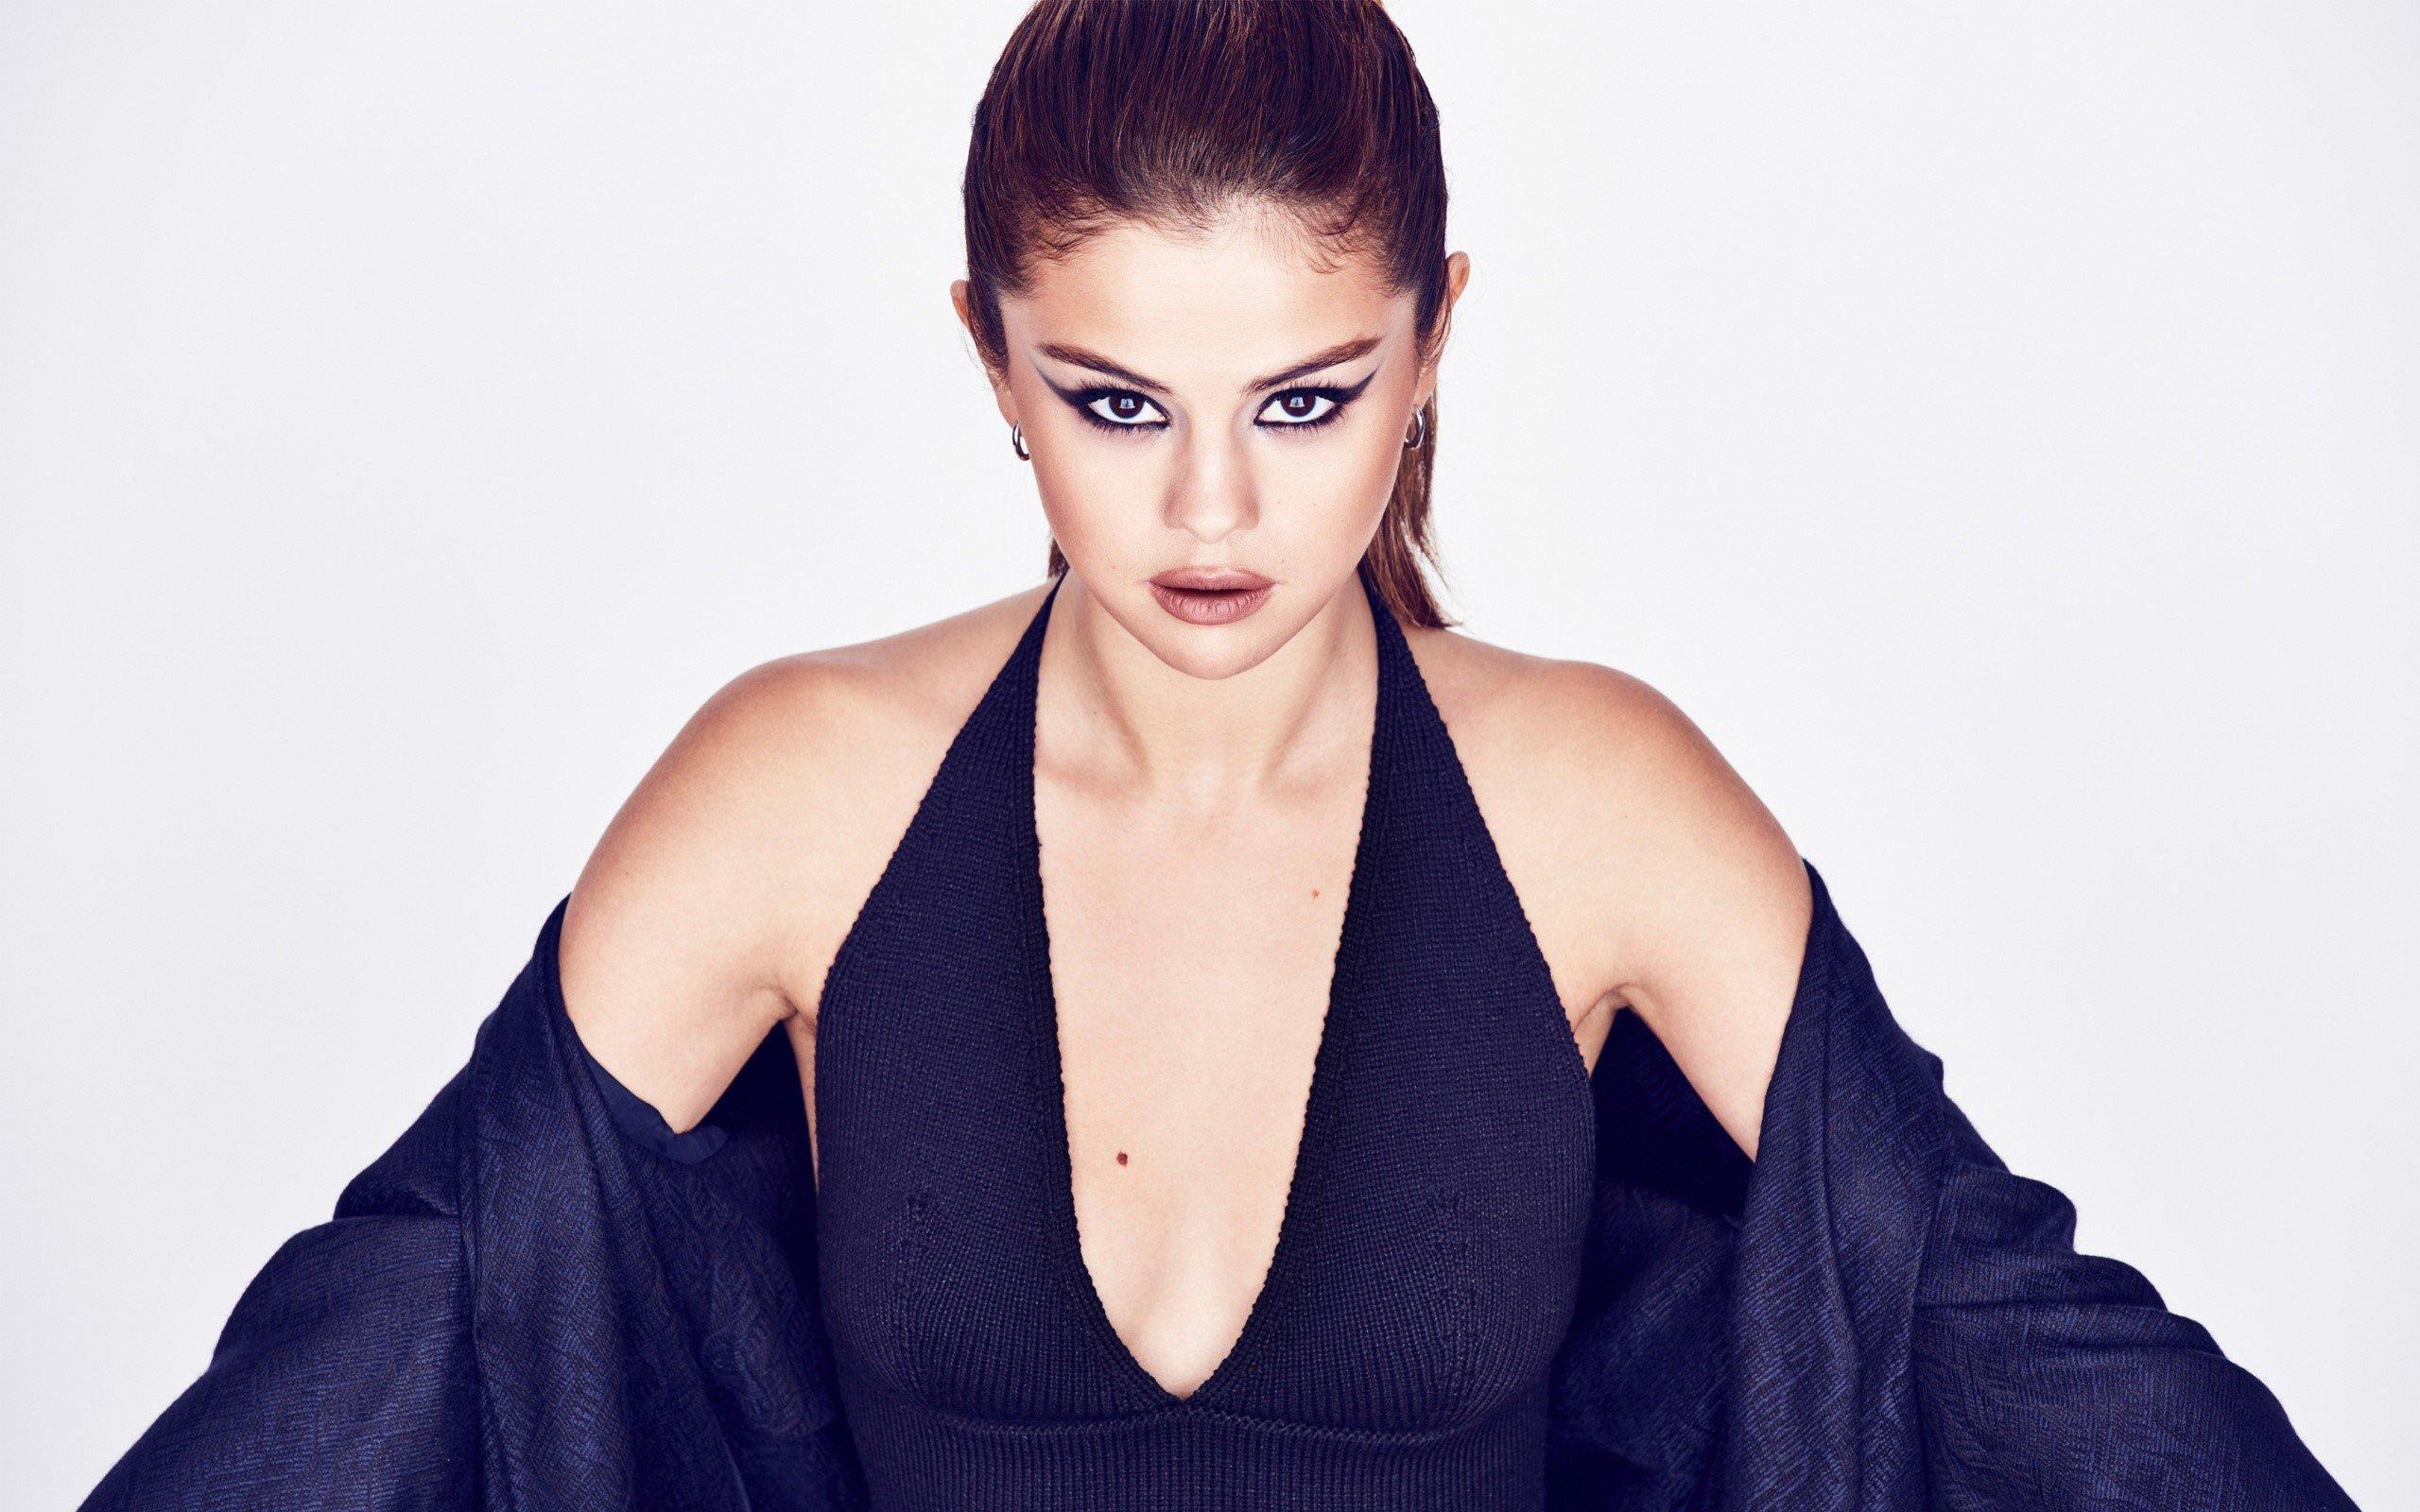 Wallpaper Selena Gomez en vestido negro Images